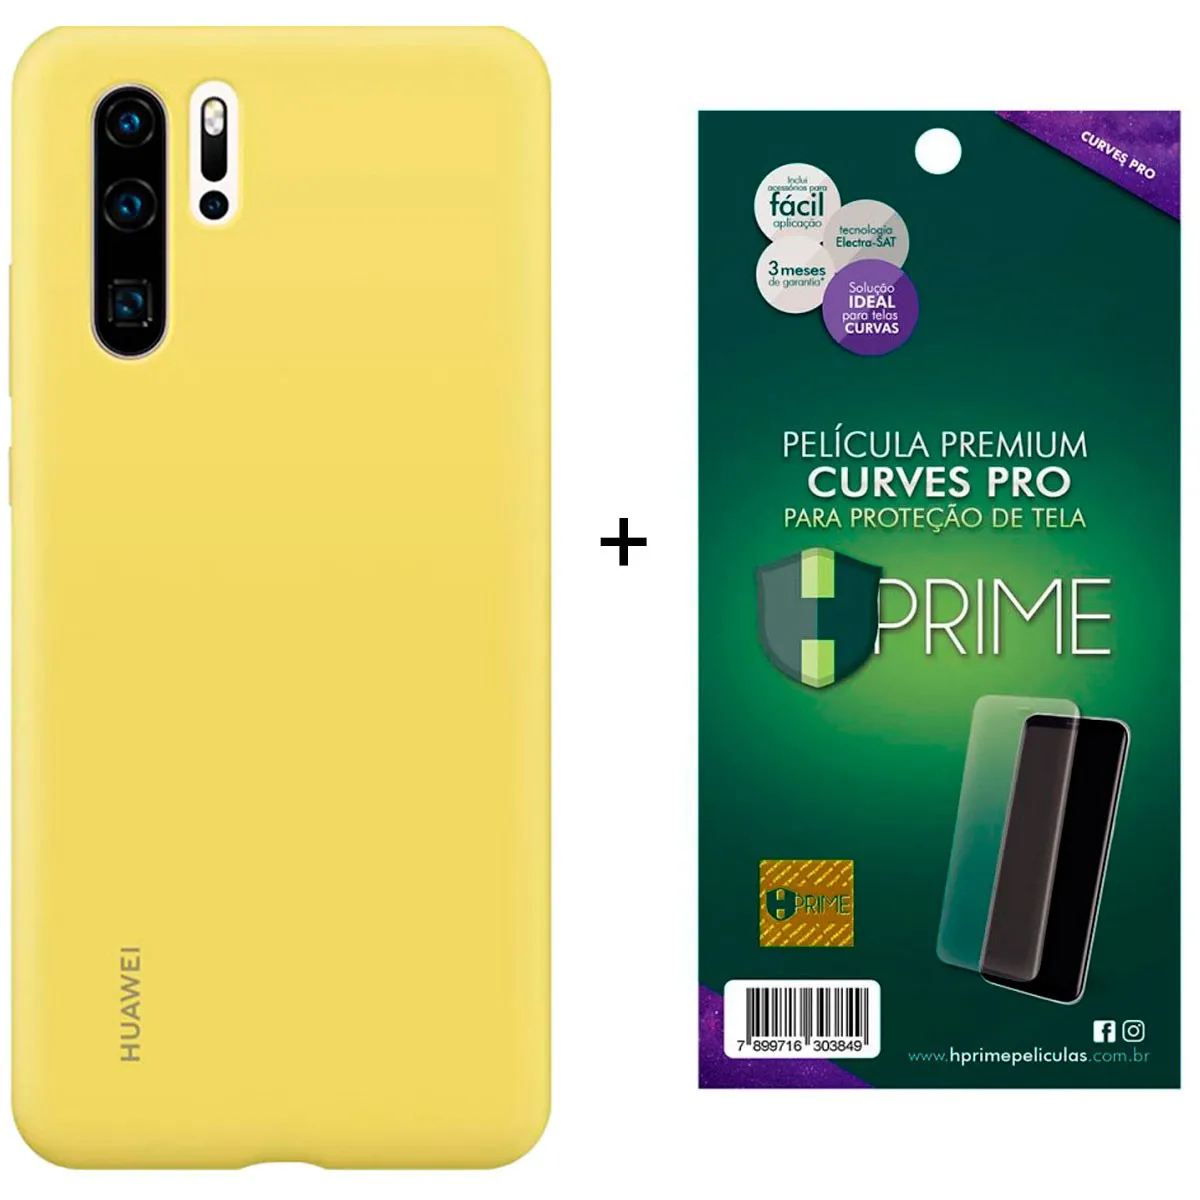 Capa Protetora Silicone Huawei P30 Pro Amarela Original + Película Premium Hprime Huawei P30 Pro - Curves Pro BRINDE